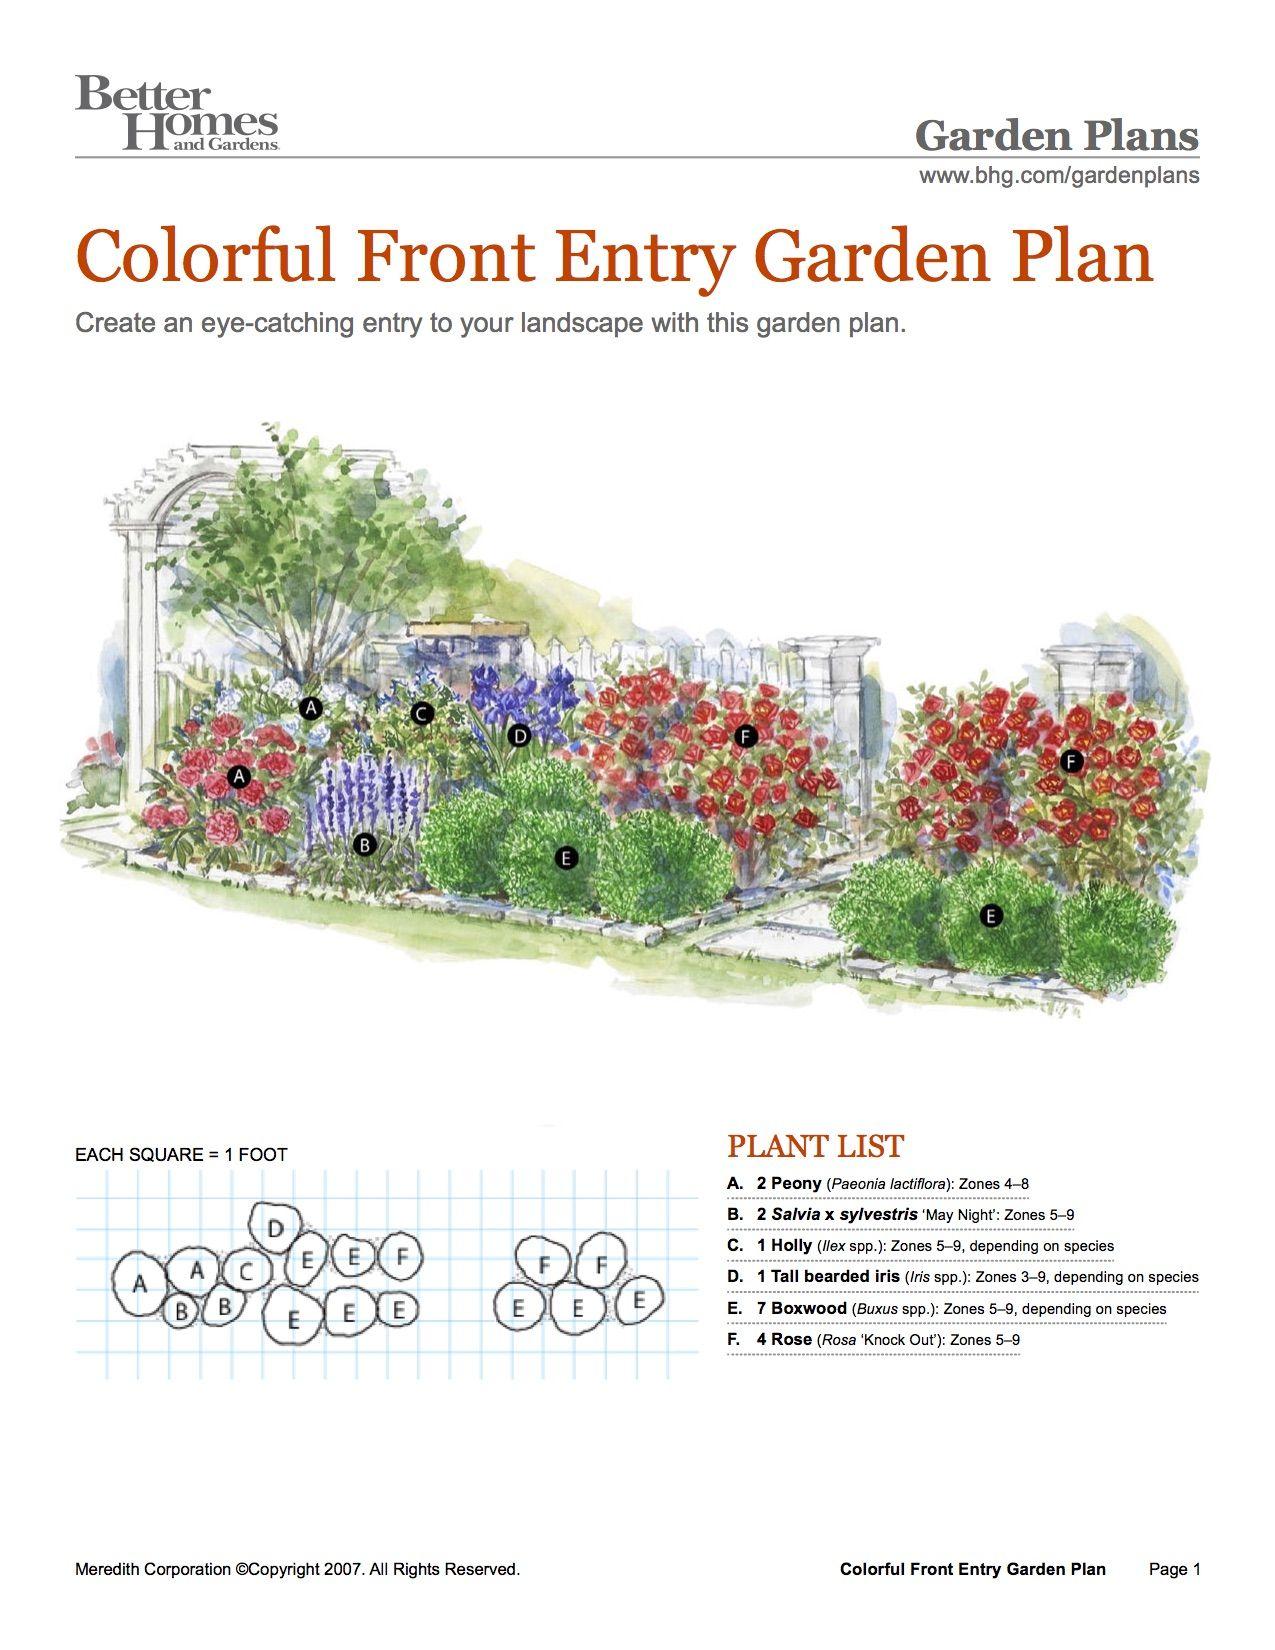 BHG Colorful Front Entry Garden Plan Flower garden